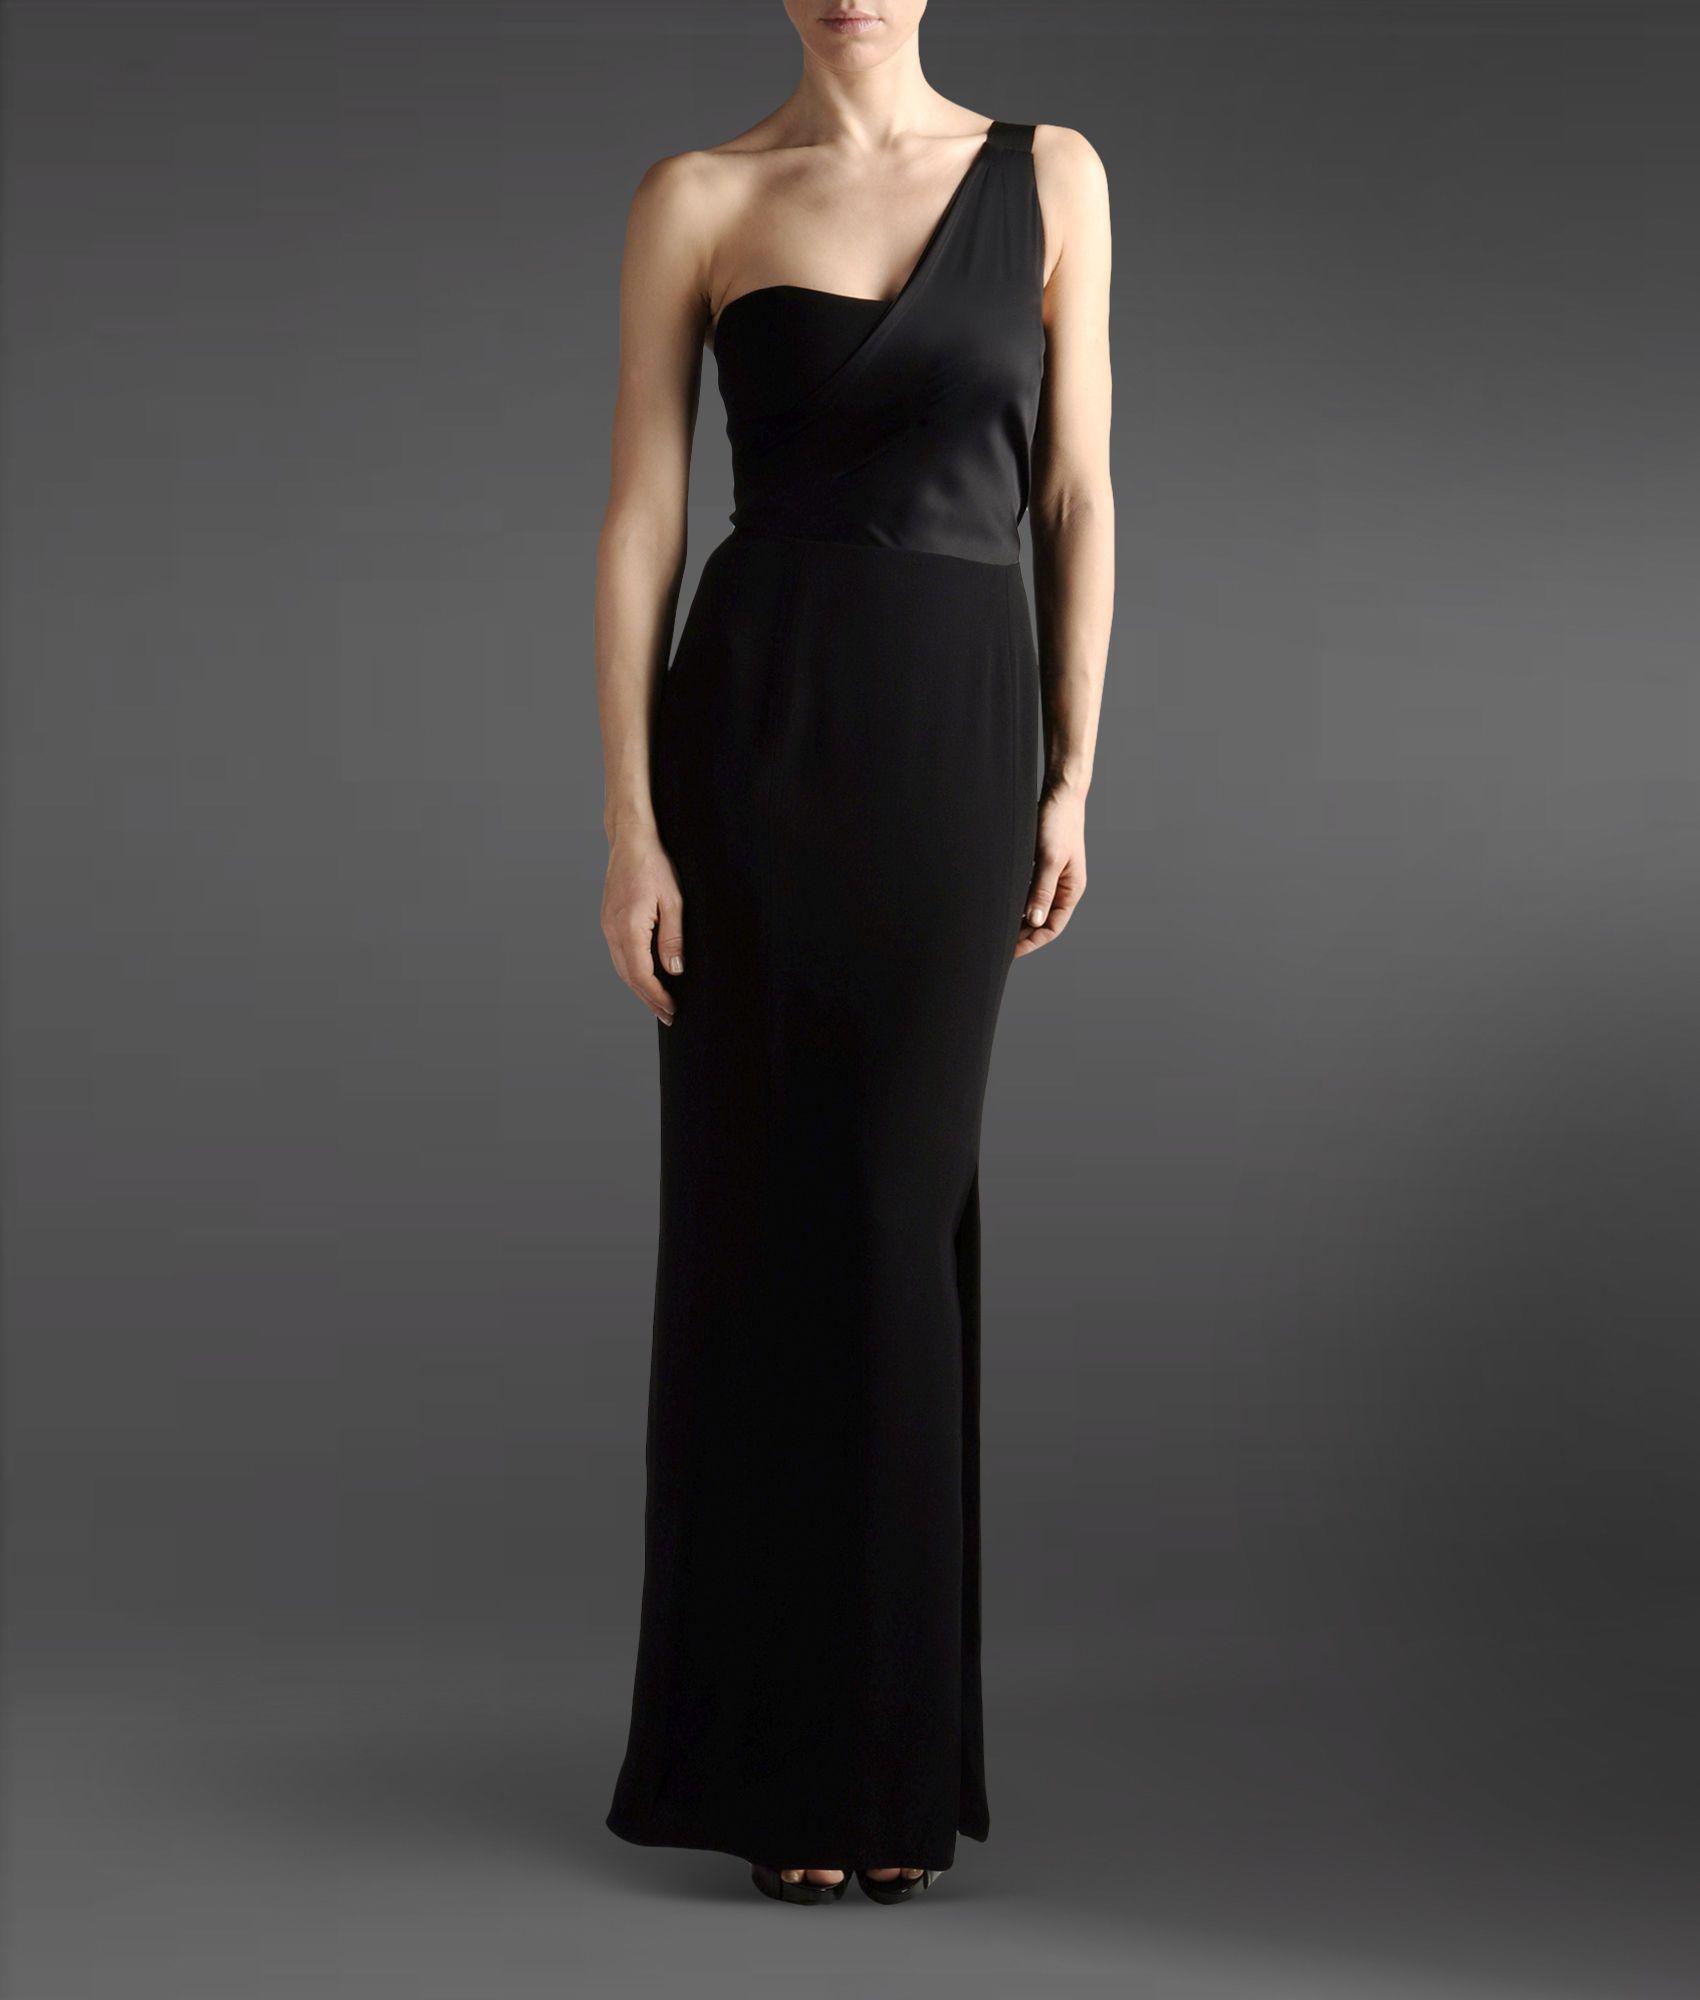 Lyst - Emporio Armani Long Dress in Black